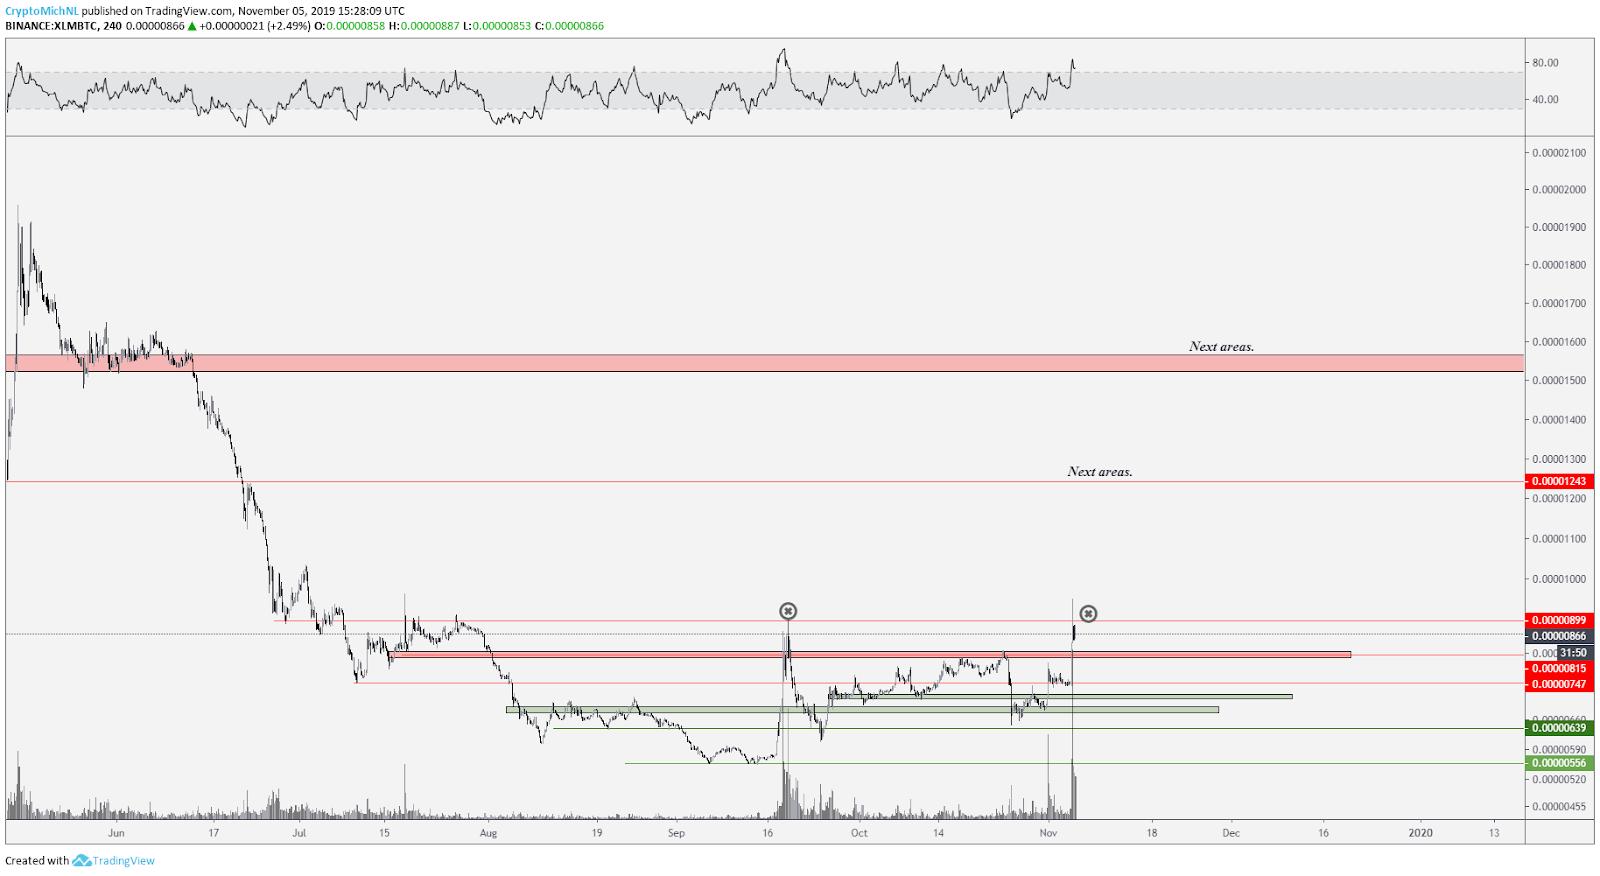 XLM BTC 4-hour chart